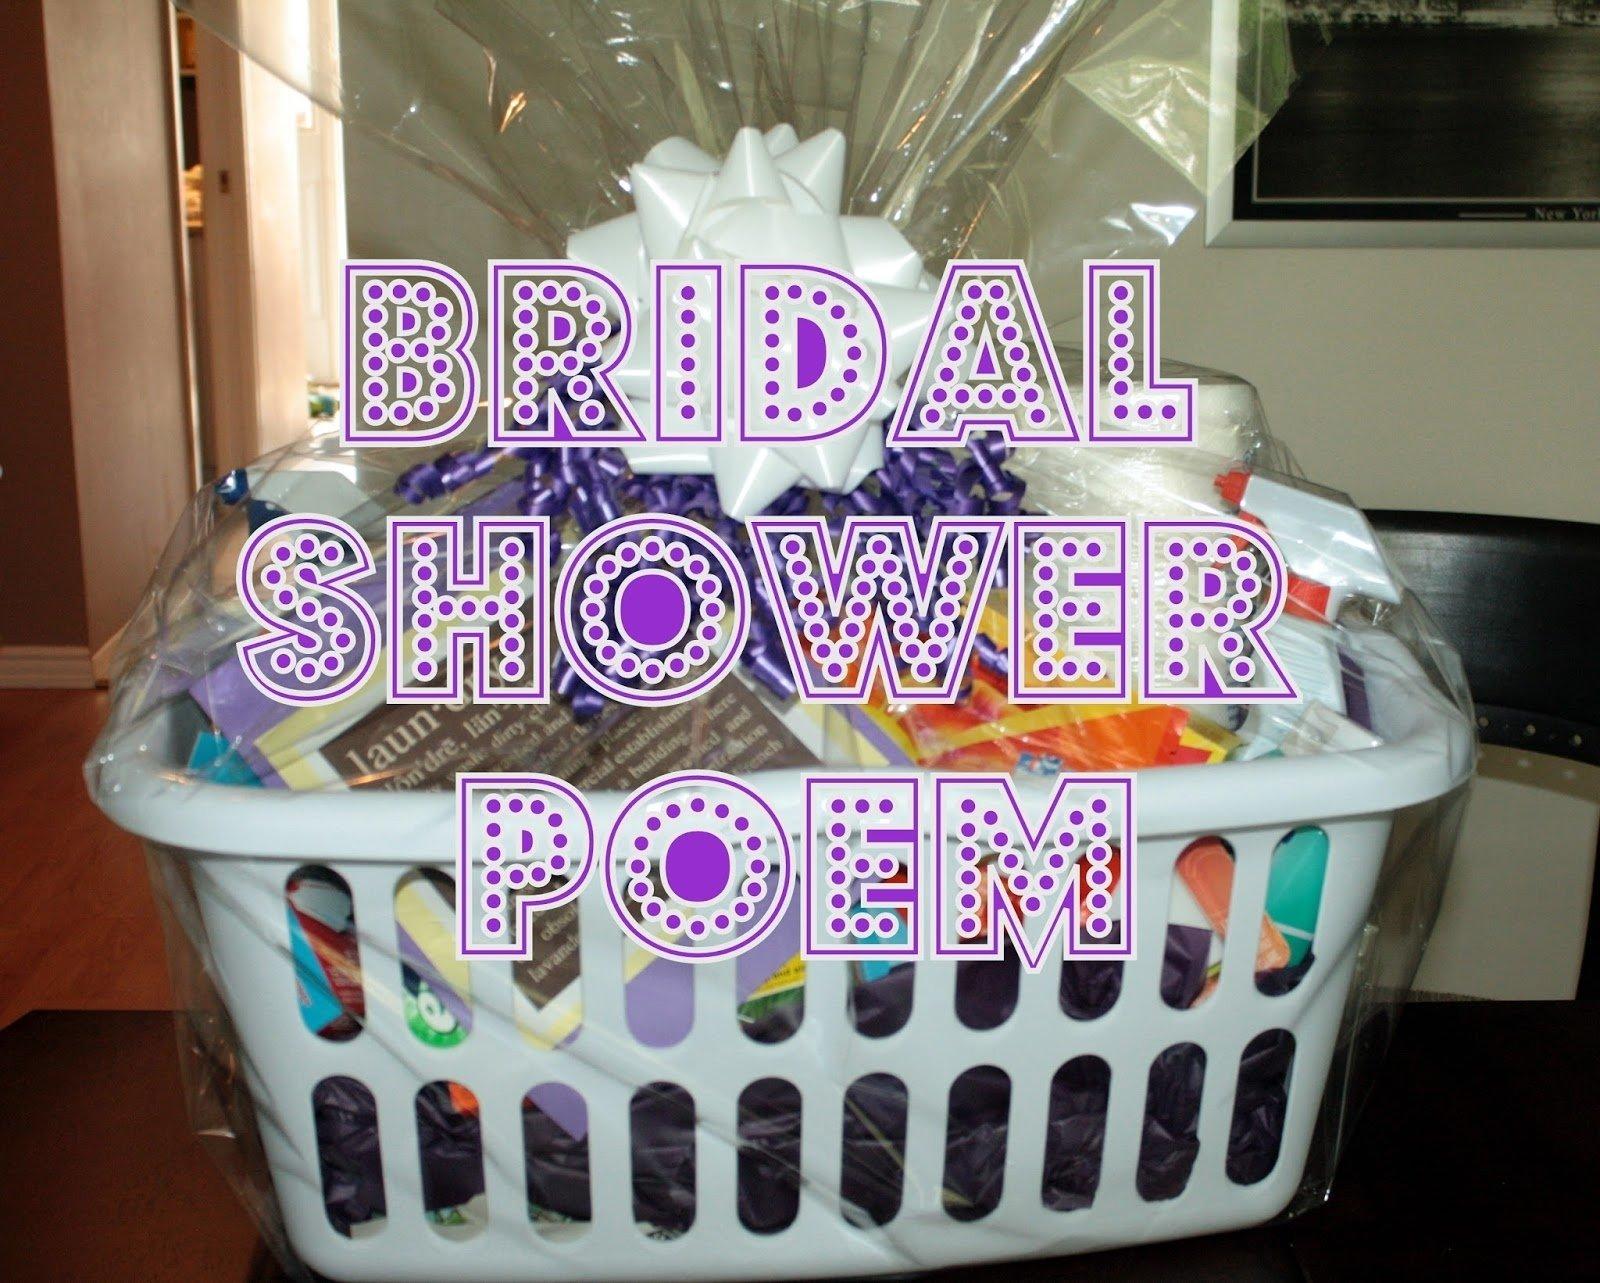 10 Nice Cute Wedding Shower Gift Ideas gingerbabymama fun practical bridal shower gift 8 2020